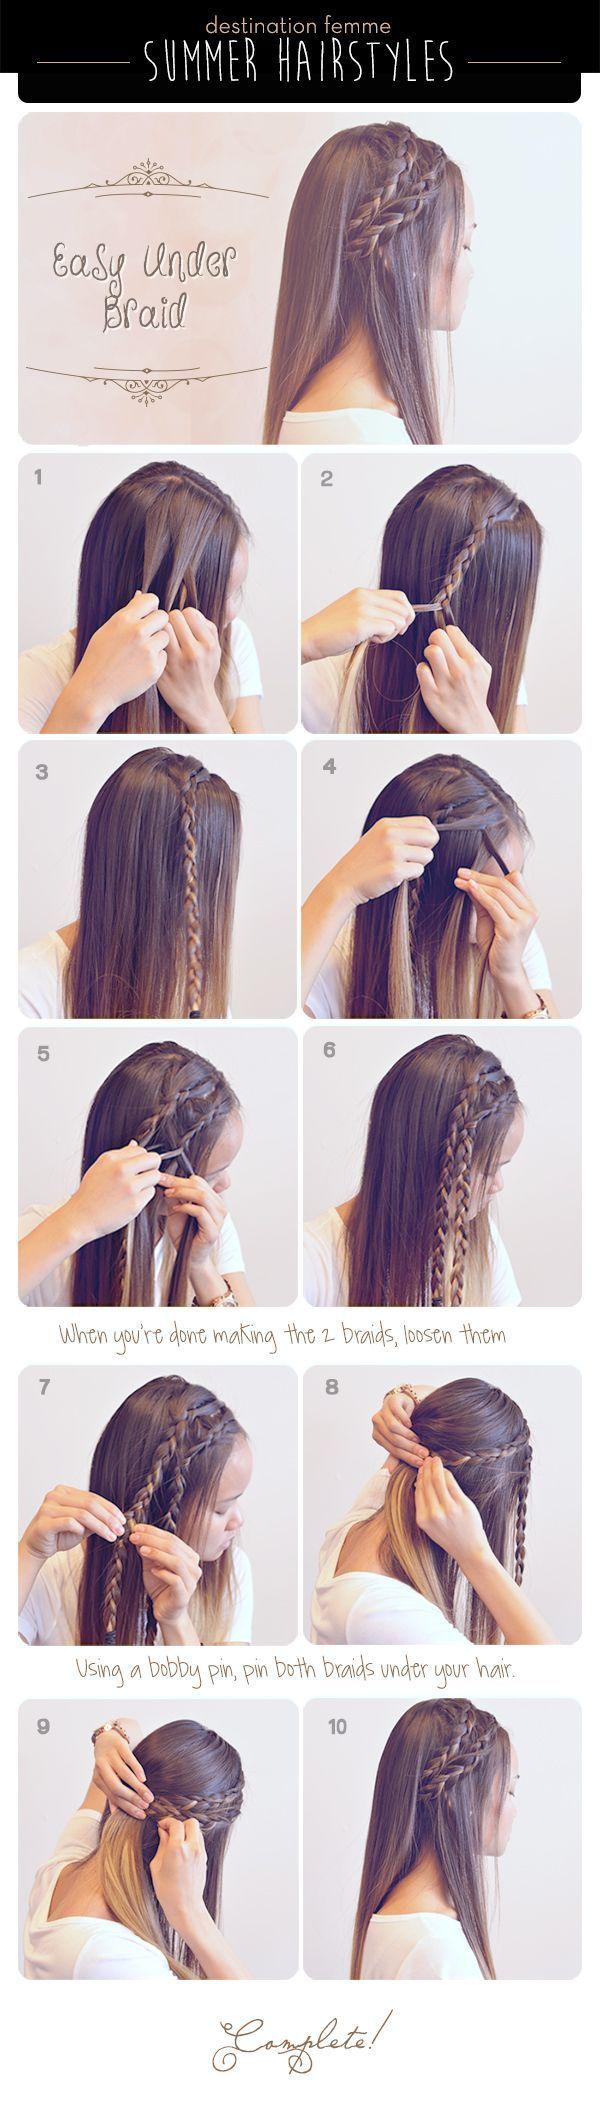 nice 3 Cute & Easy Braided Hairdos for Summer - Destination Femme by http://www.danahaircuts.xyz/hair-tutorials/3-cute-easy-braided-hairdos-for-summer-destination-femme/